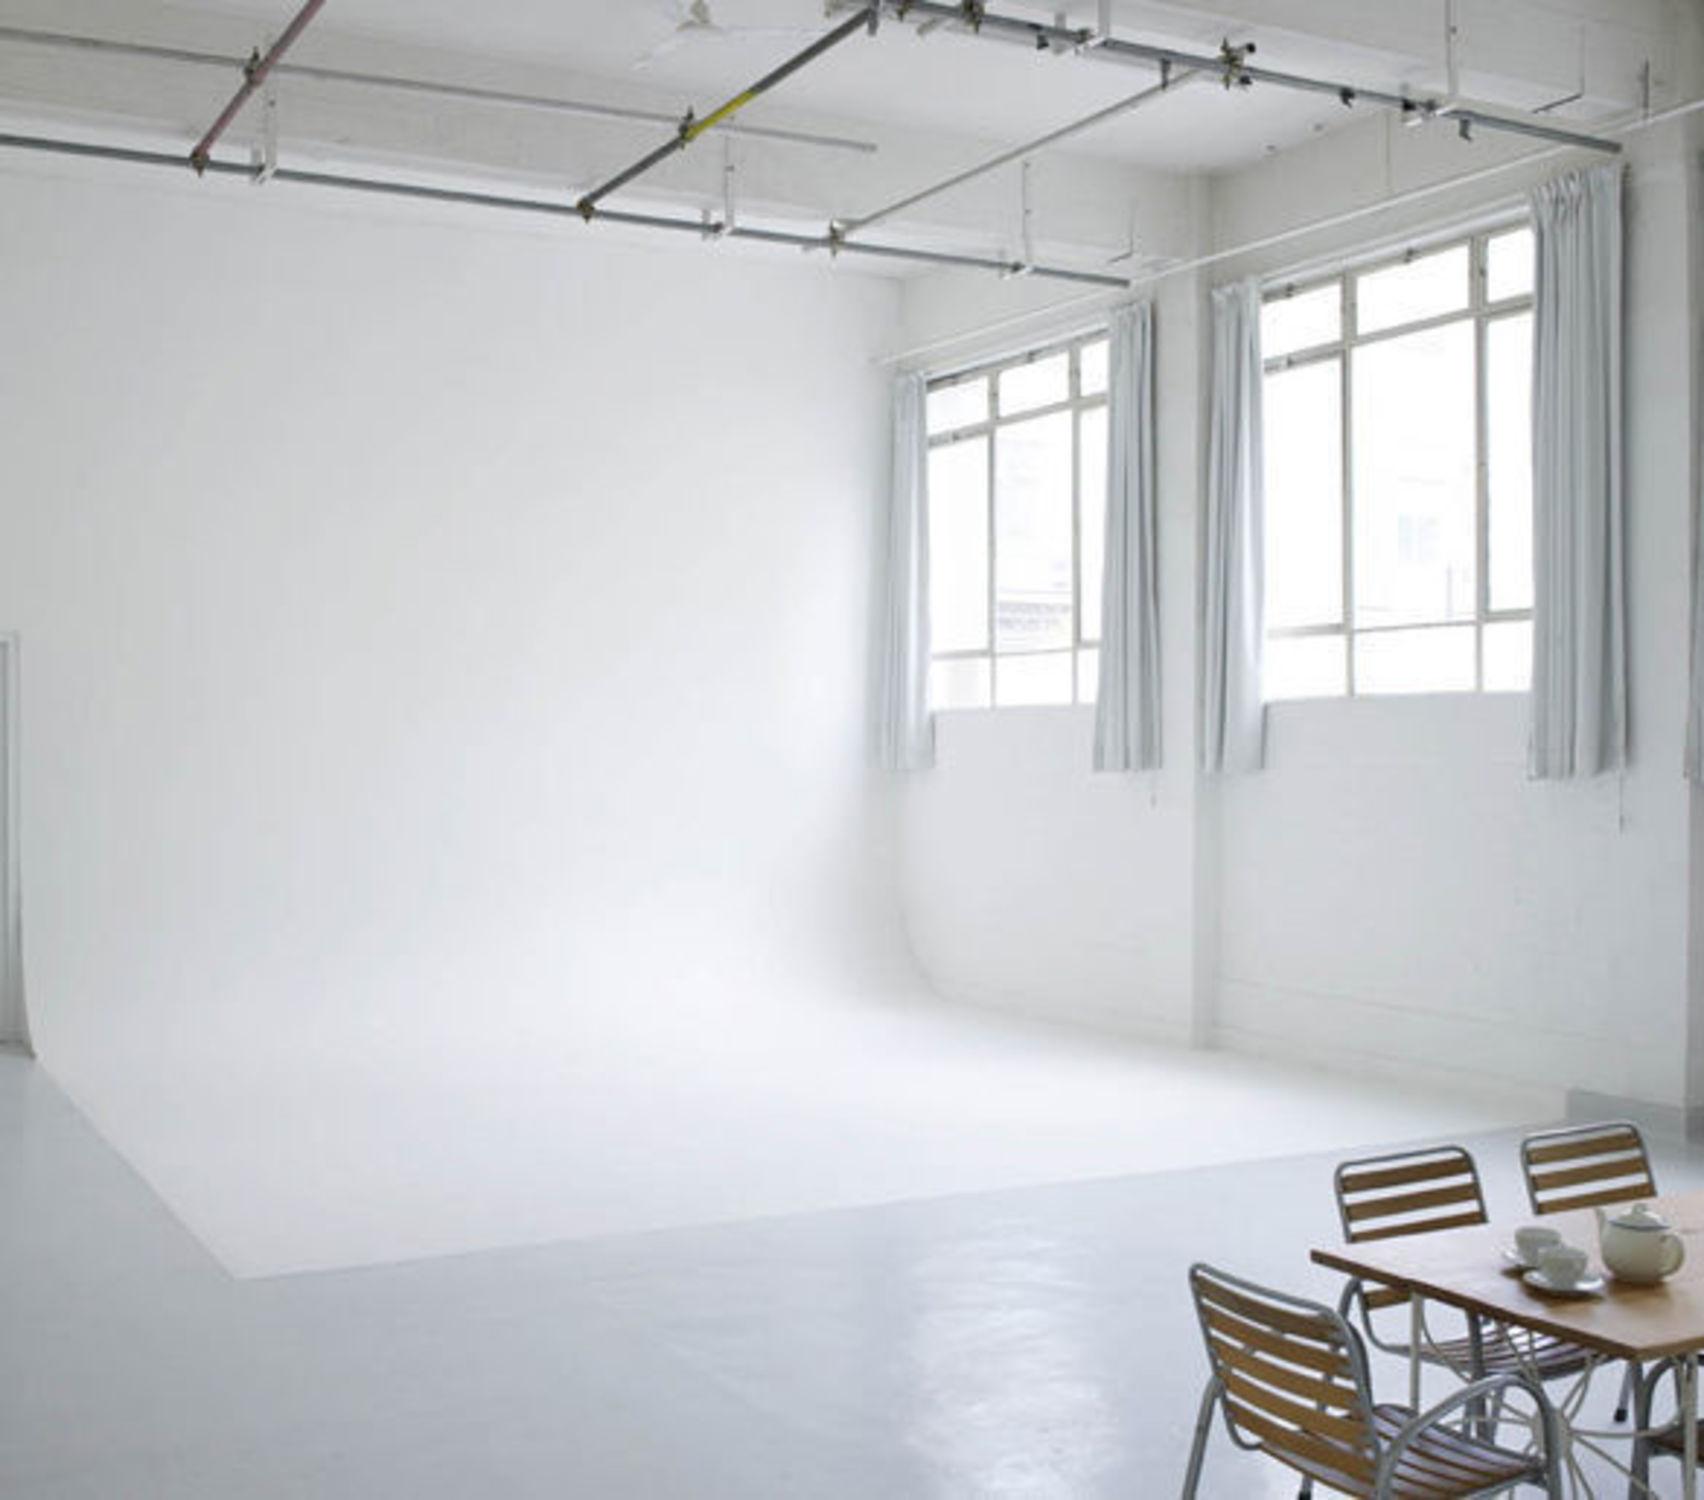 Day Hire, Studio Three, Street Studios